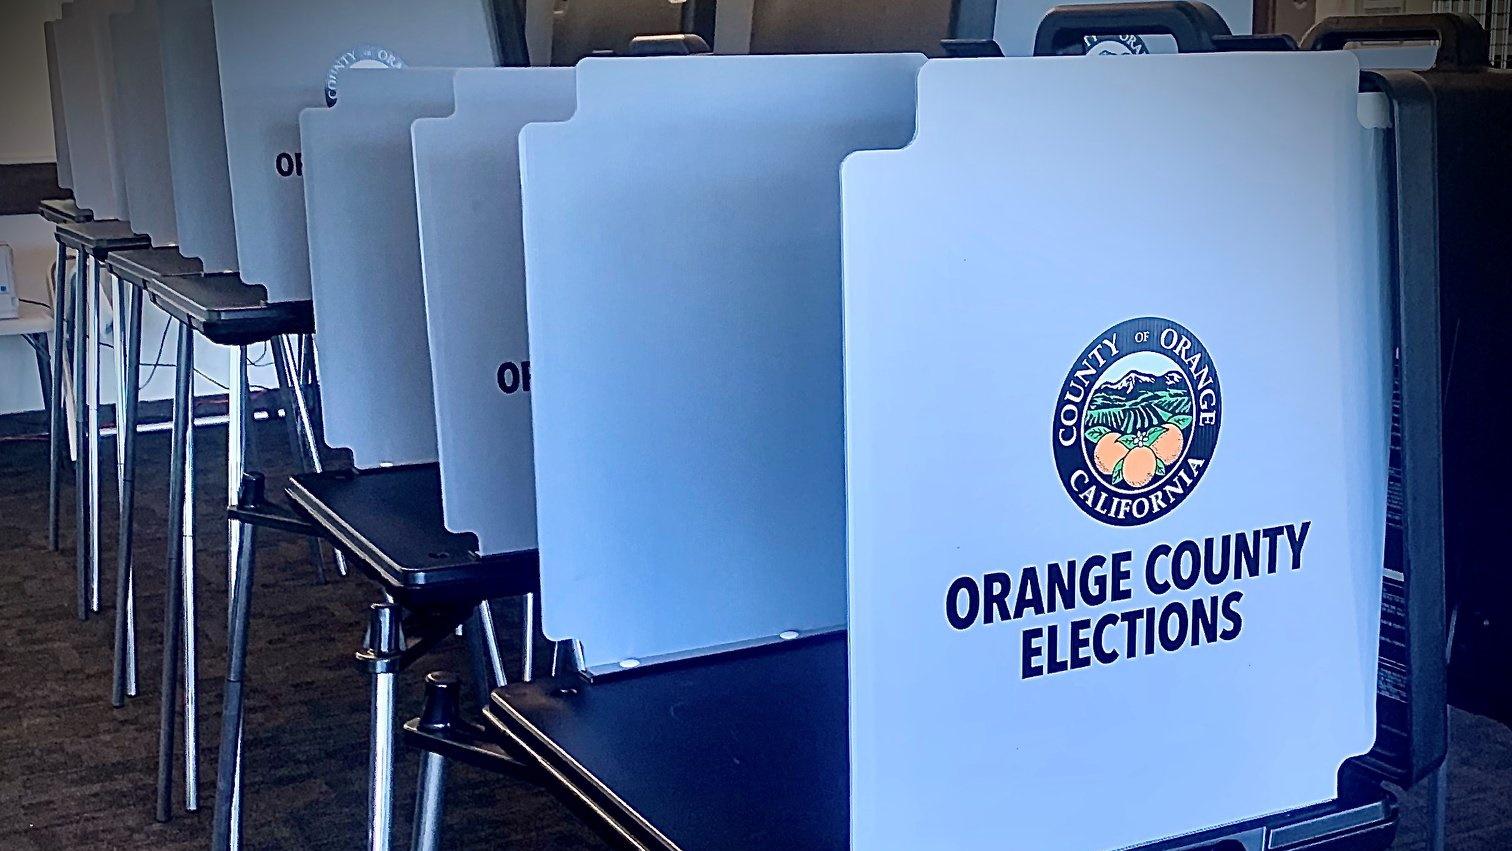 oc elections